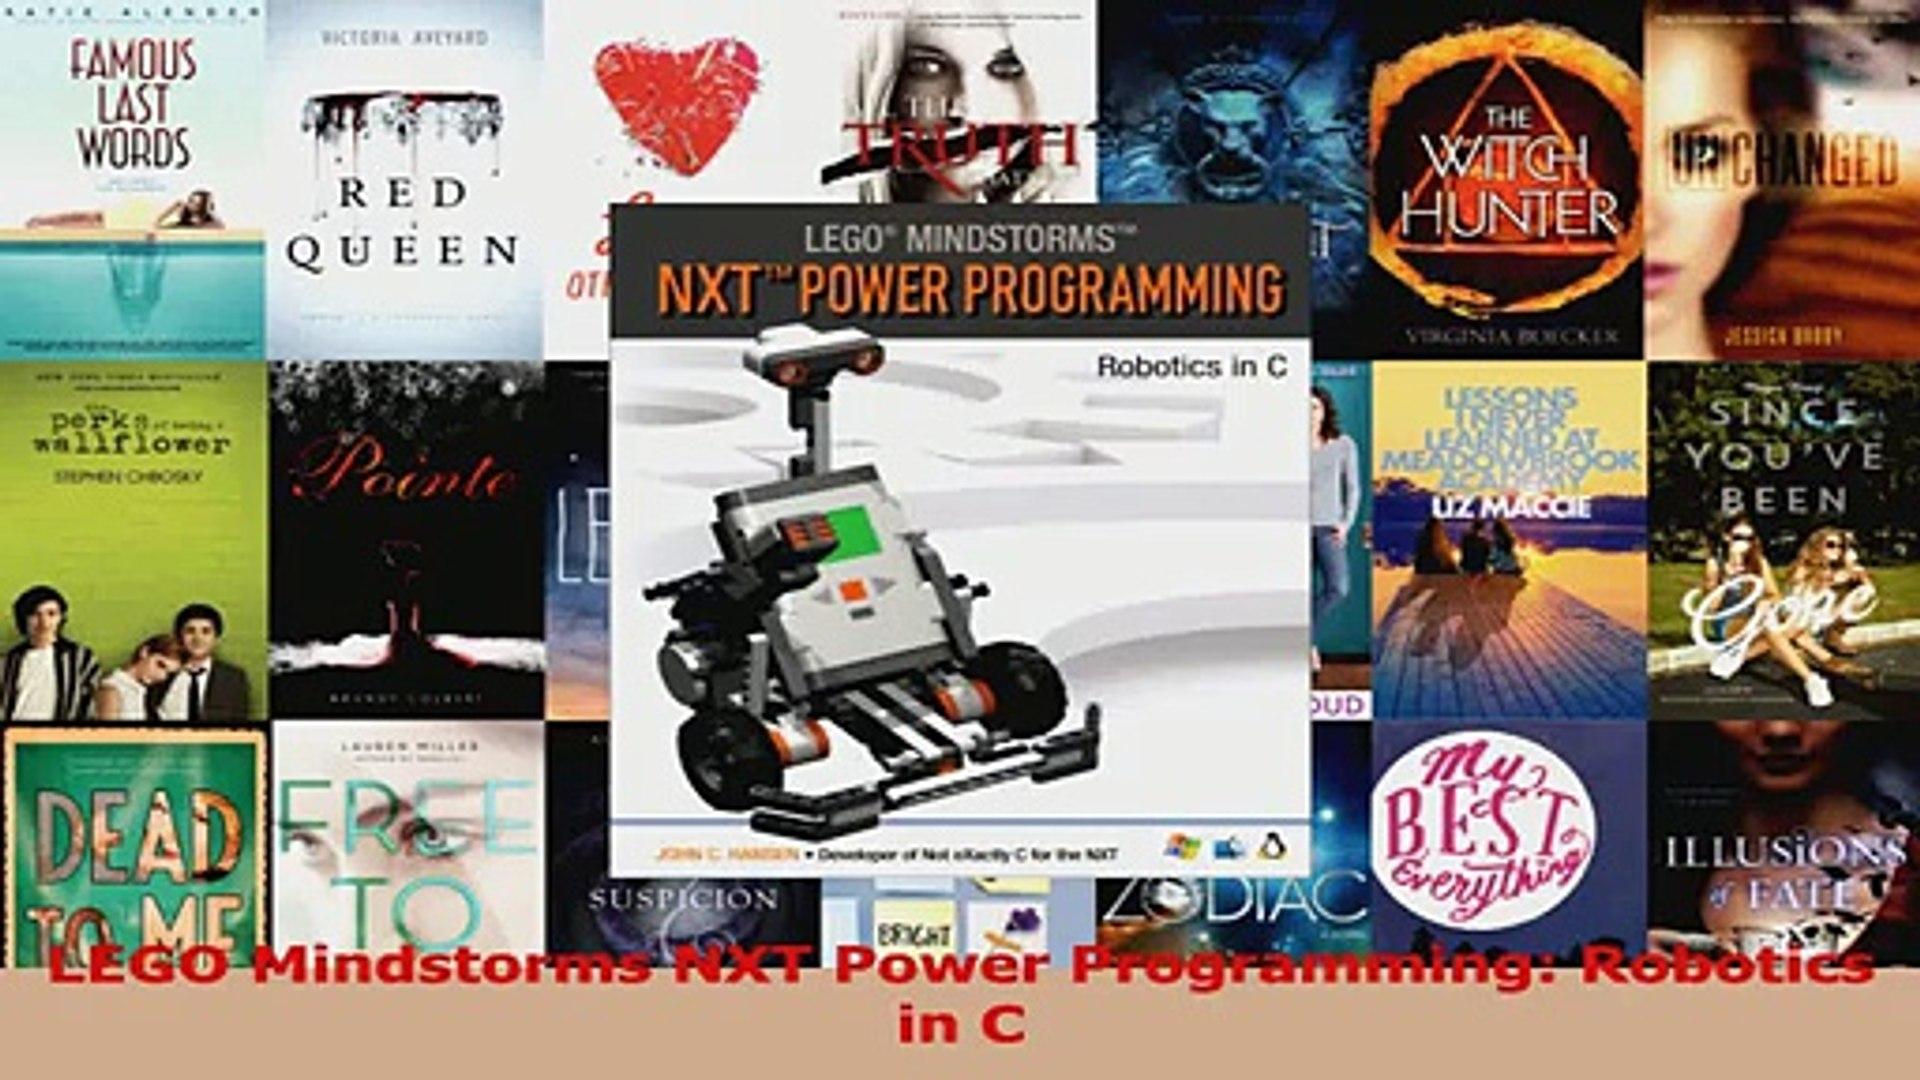 Read LEGO Mindstorms NXT Power Programming Robotics in C PDF Free